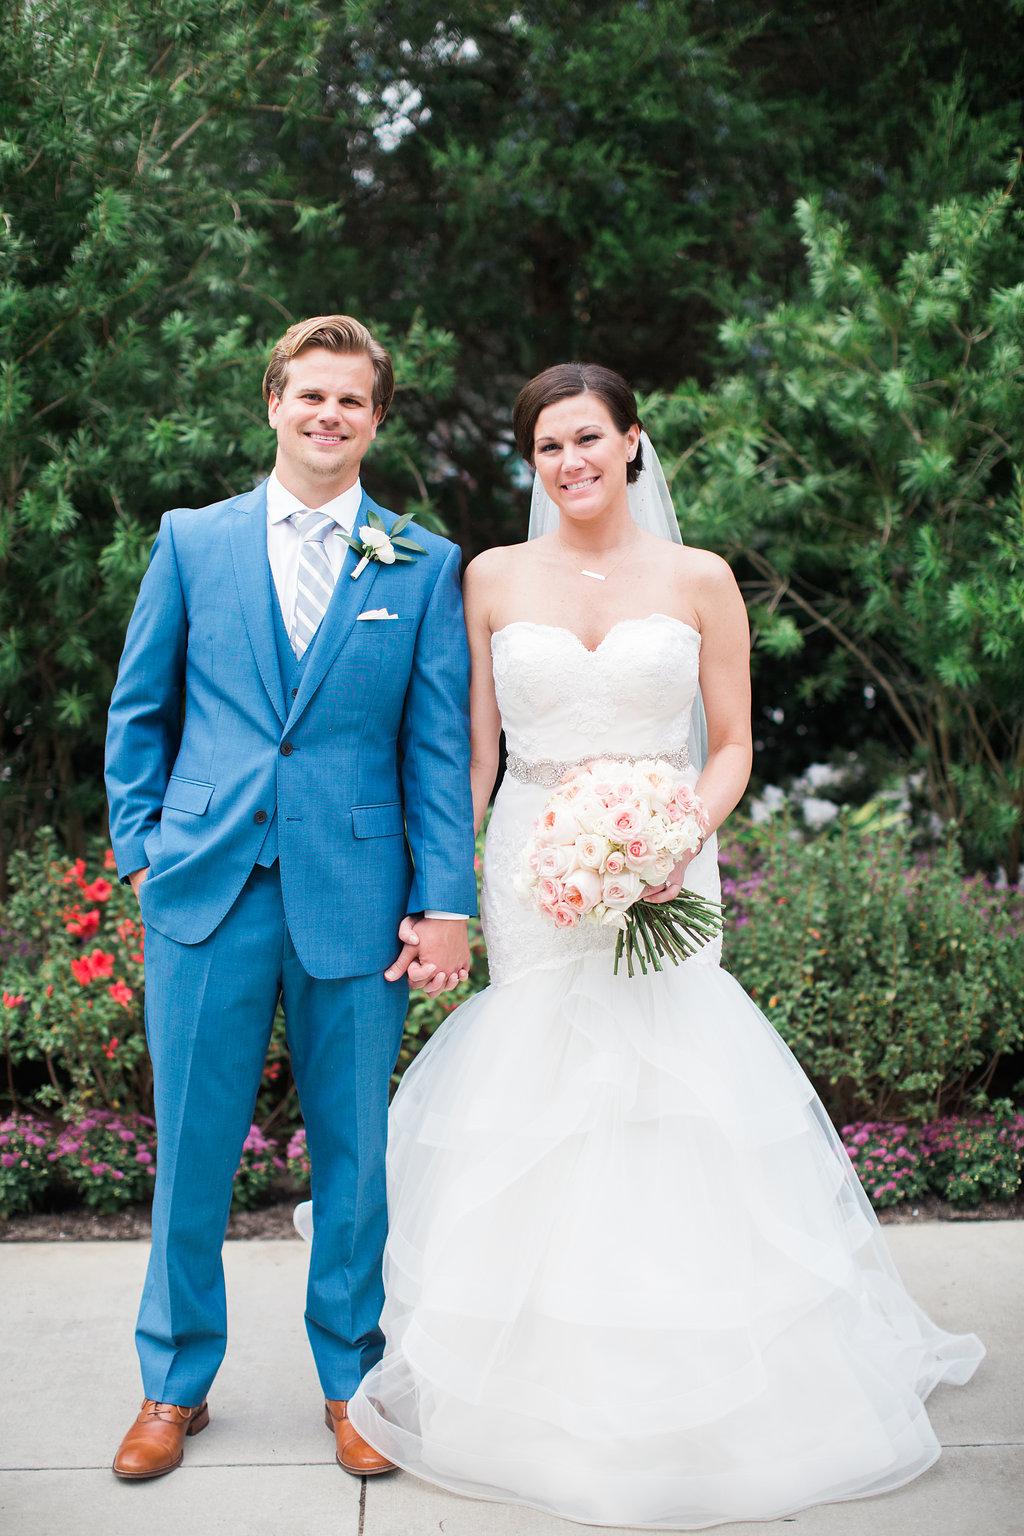 apt-b-photography-ivory-and-beau-bridal-boutique-savannah-florist-savannah-wedding-flowers-savannah-wedding-planner-tybee-island-wedding-chapel-wedding-rose-bouquet-blush-wedding-tybee-wedding-savannah-weddings-savannah-flowers-29.jpg